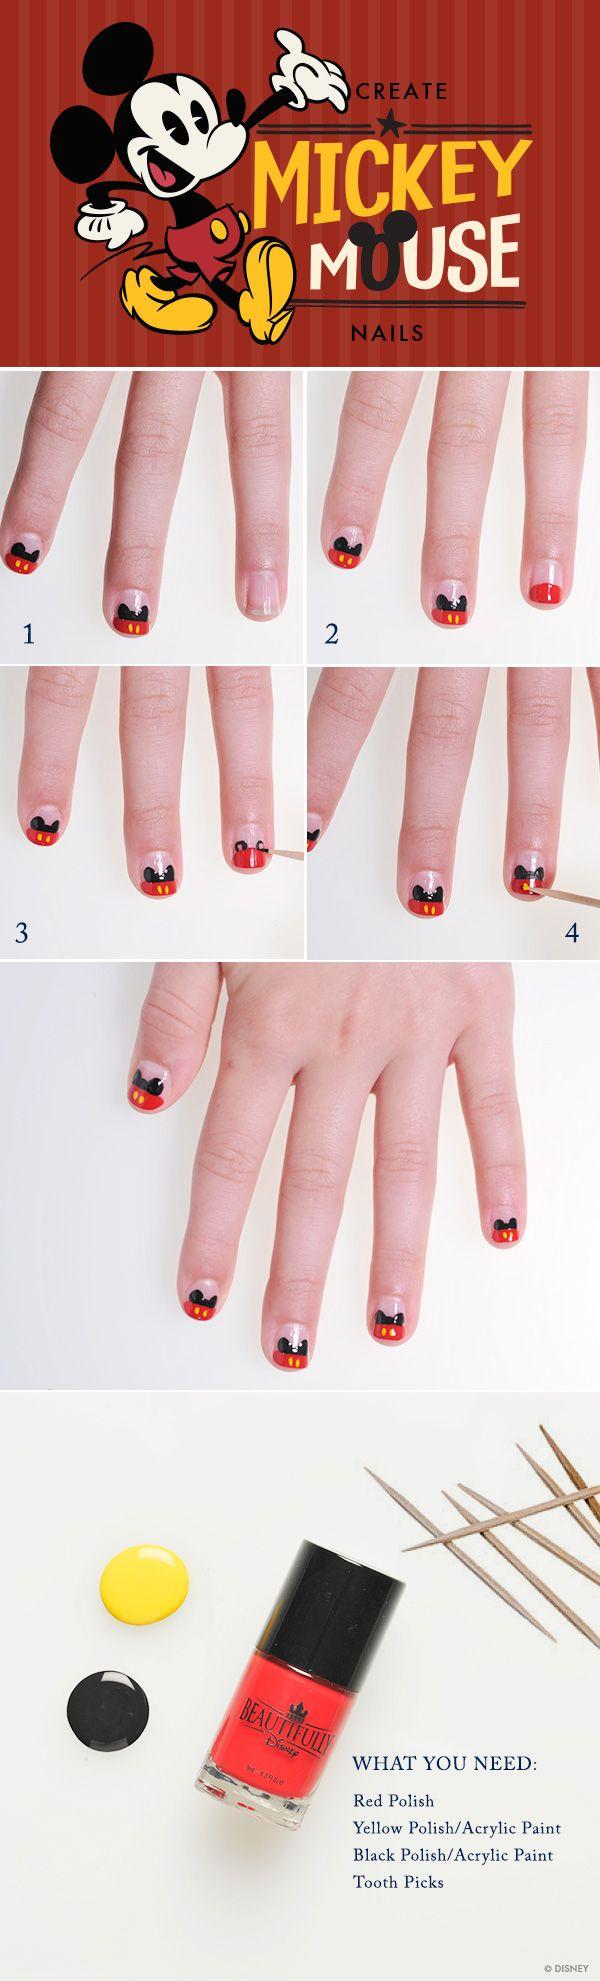 best ideas images on pinterest disney nails art chalk talk and